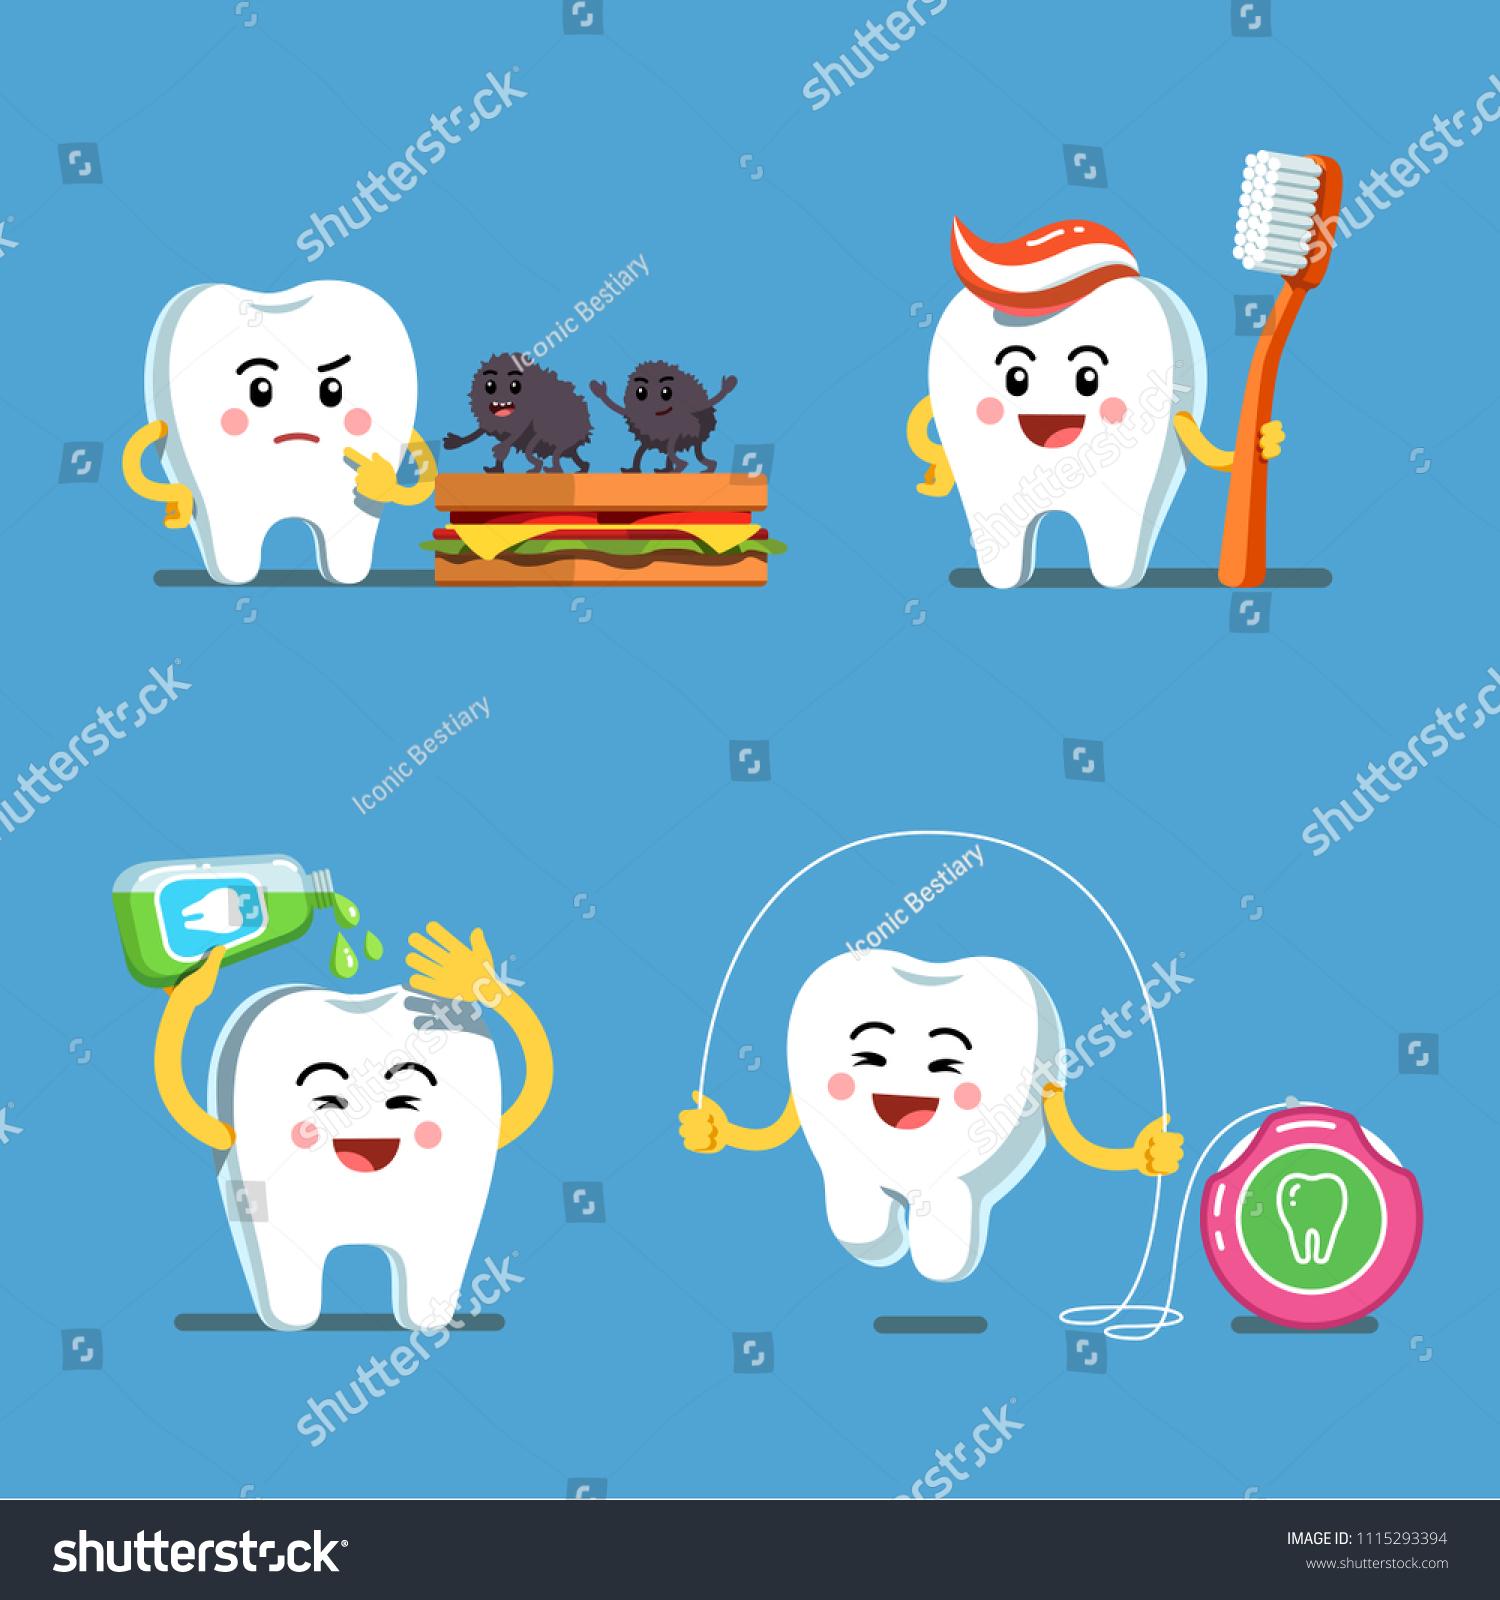 Flossing Teeth Clipart